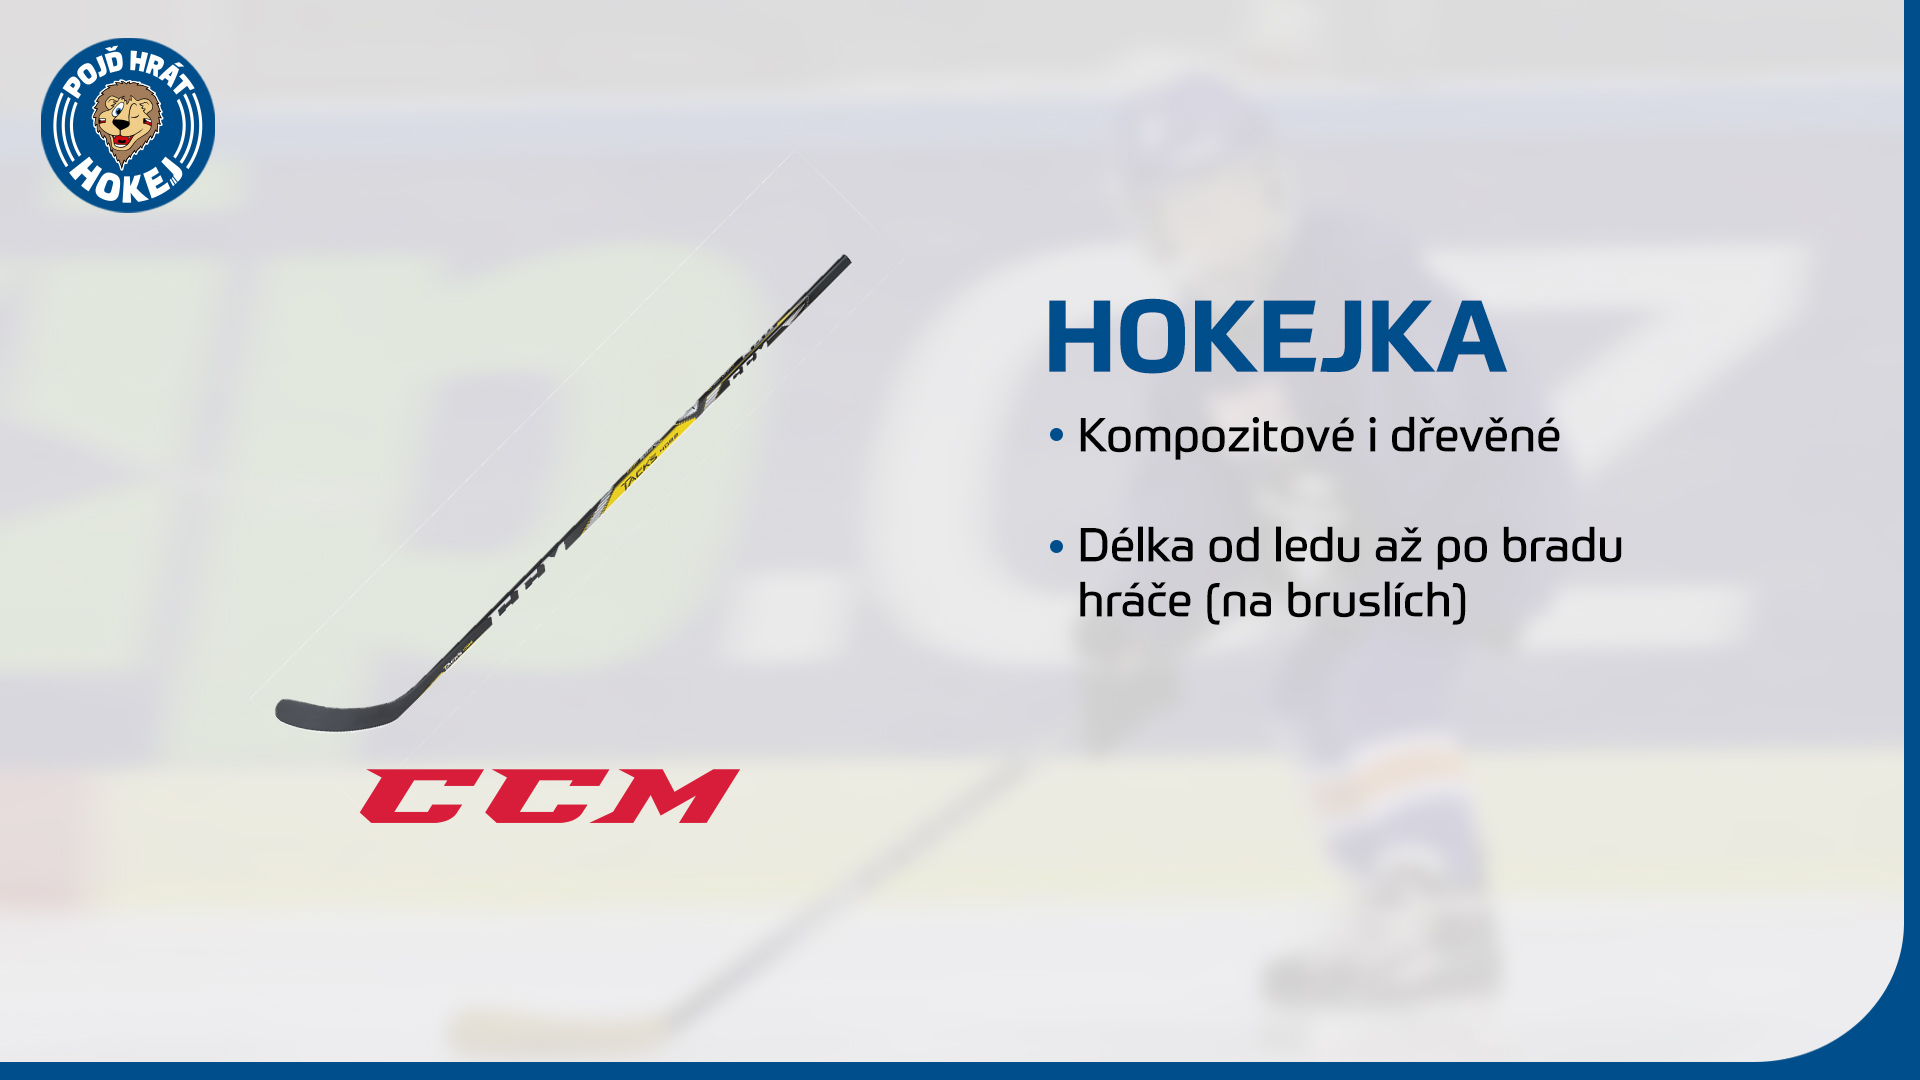 Hokejka.jpg